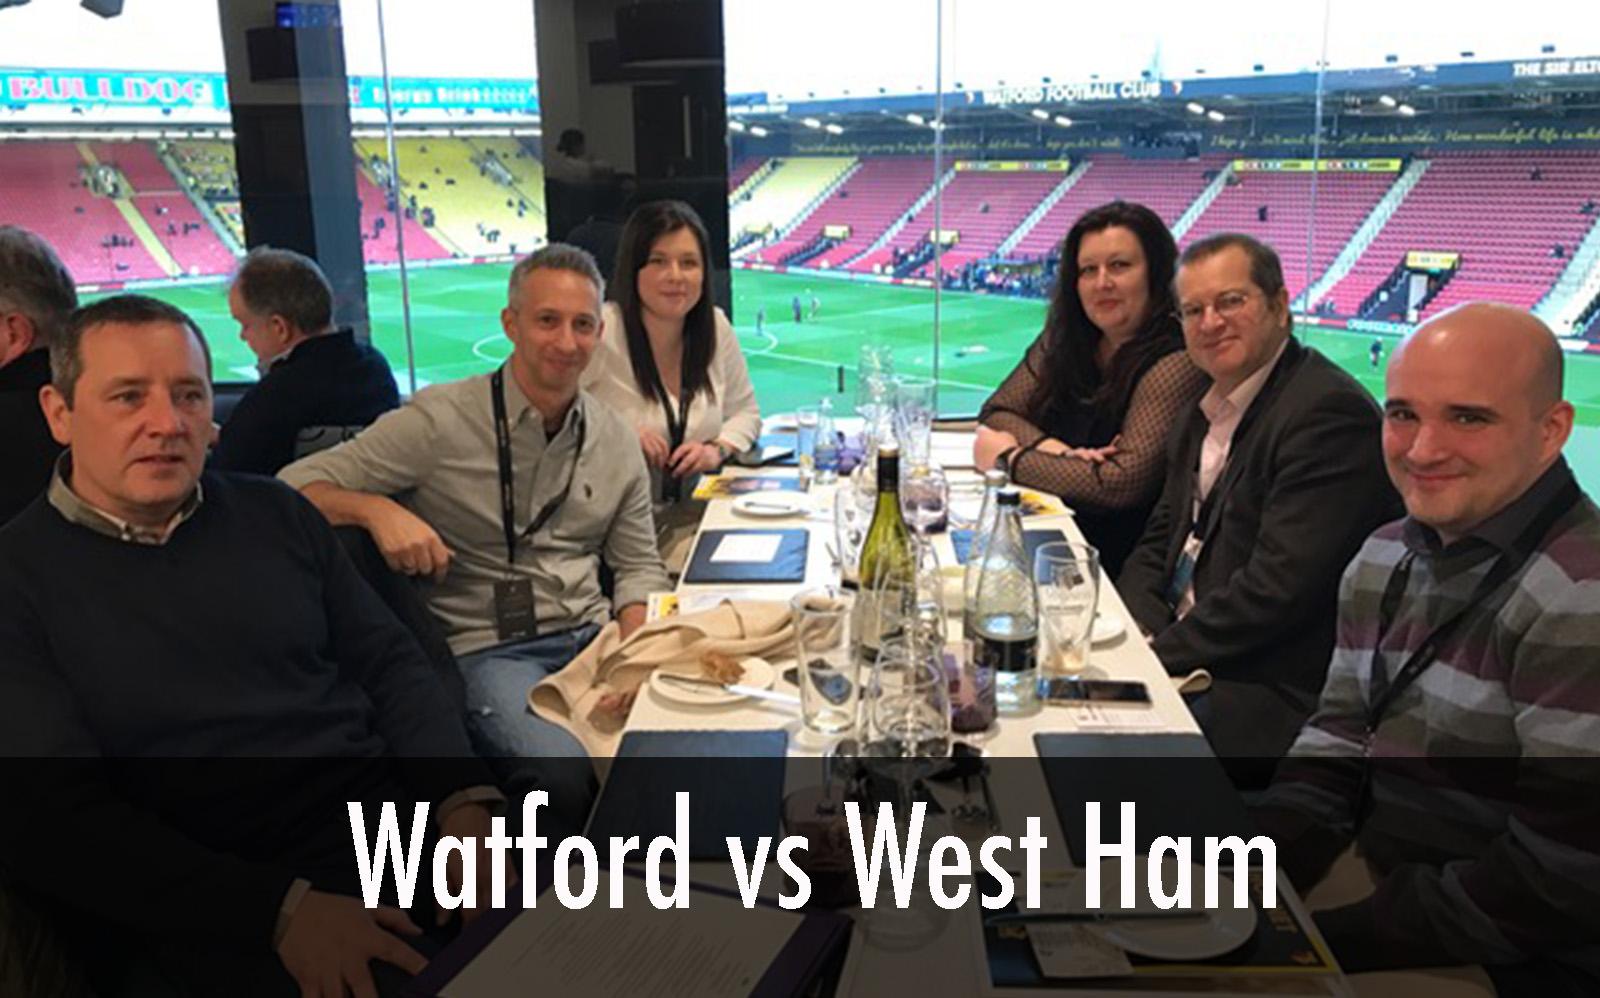 Watford Vs West Ham 1905